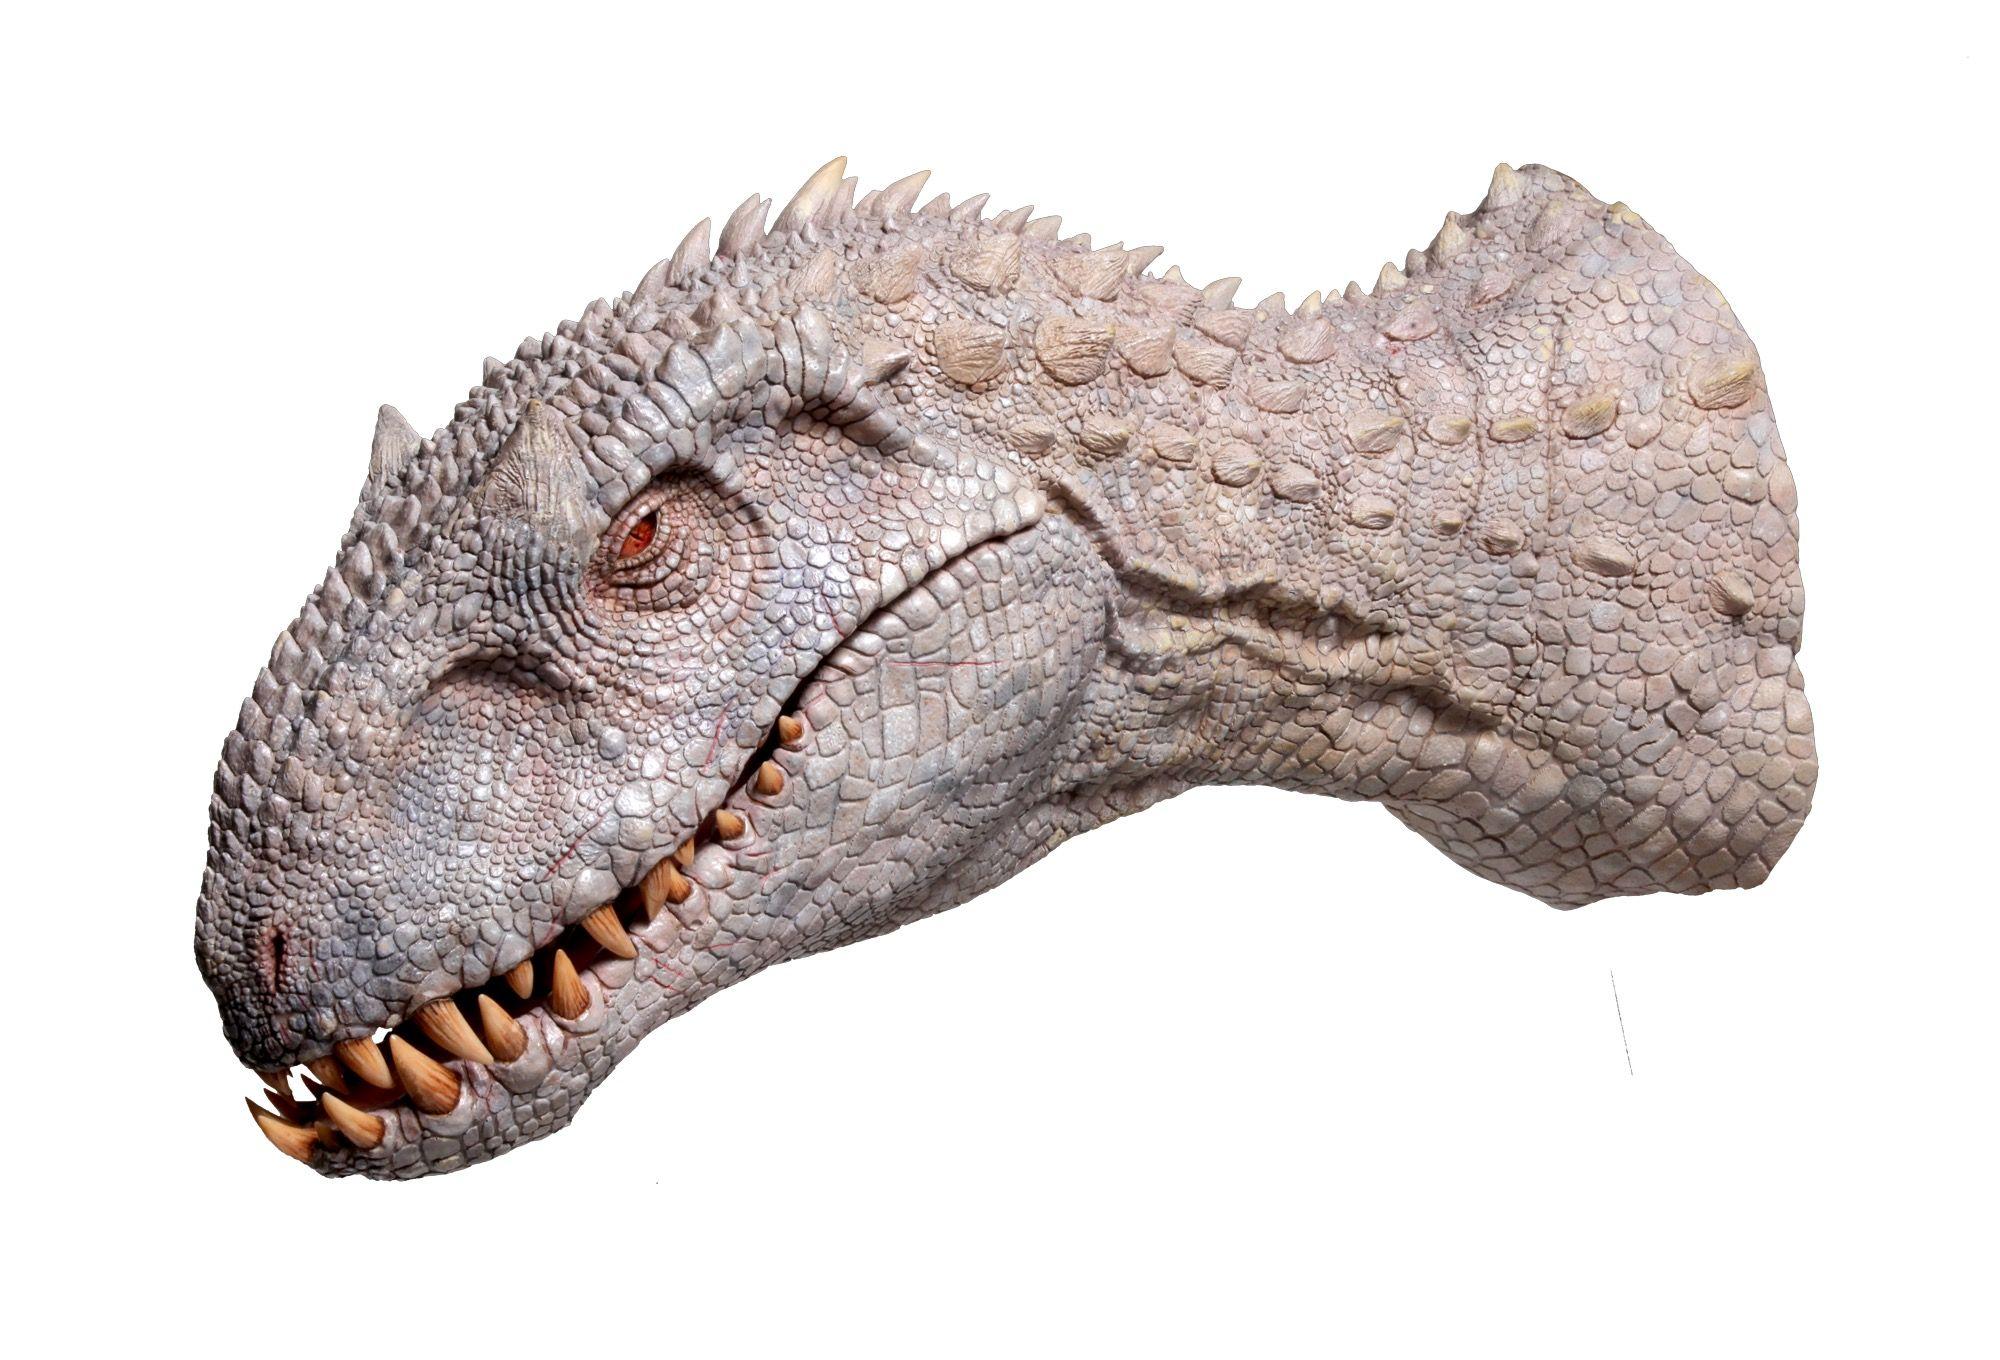 dde84e660b3 Jurassic World and Jurassic Park Props for Sale Through Fandango ...